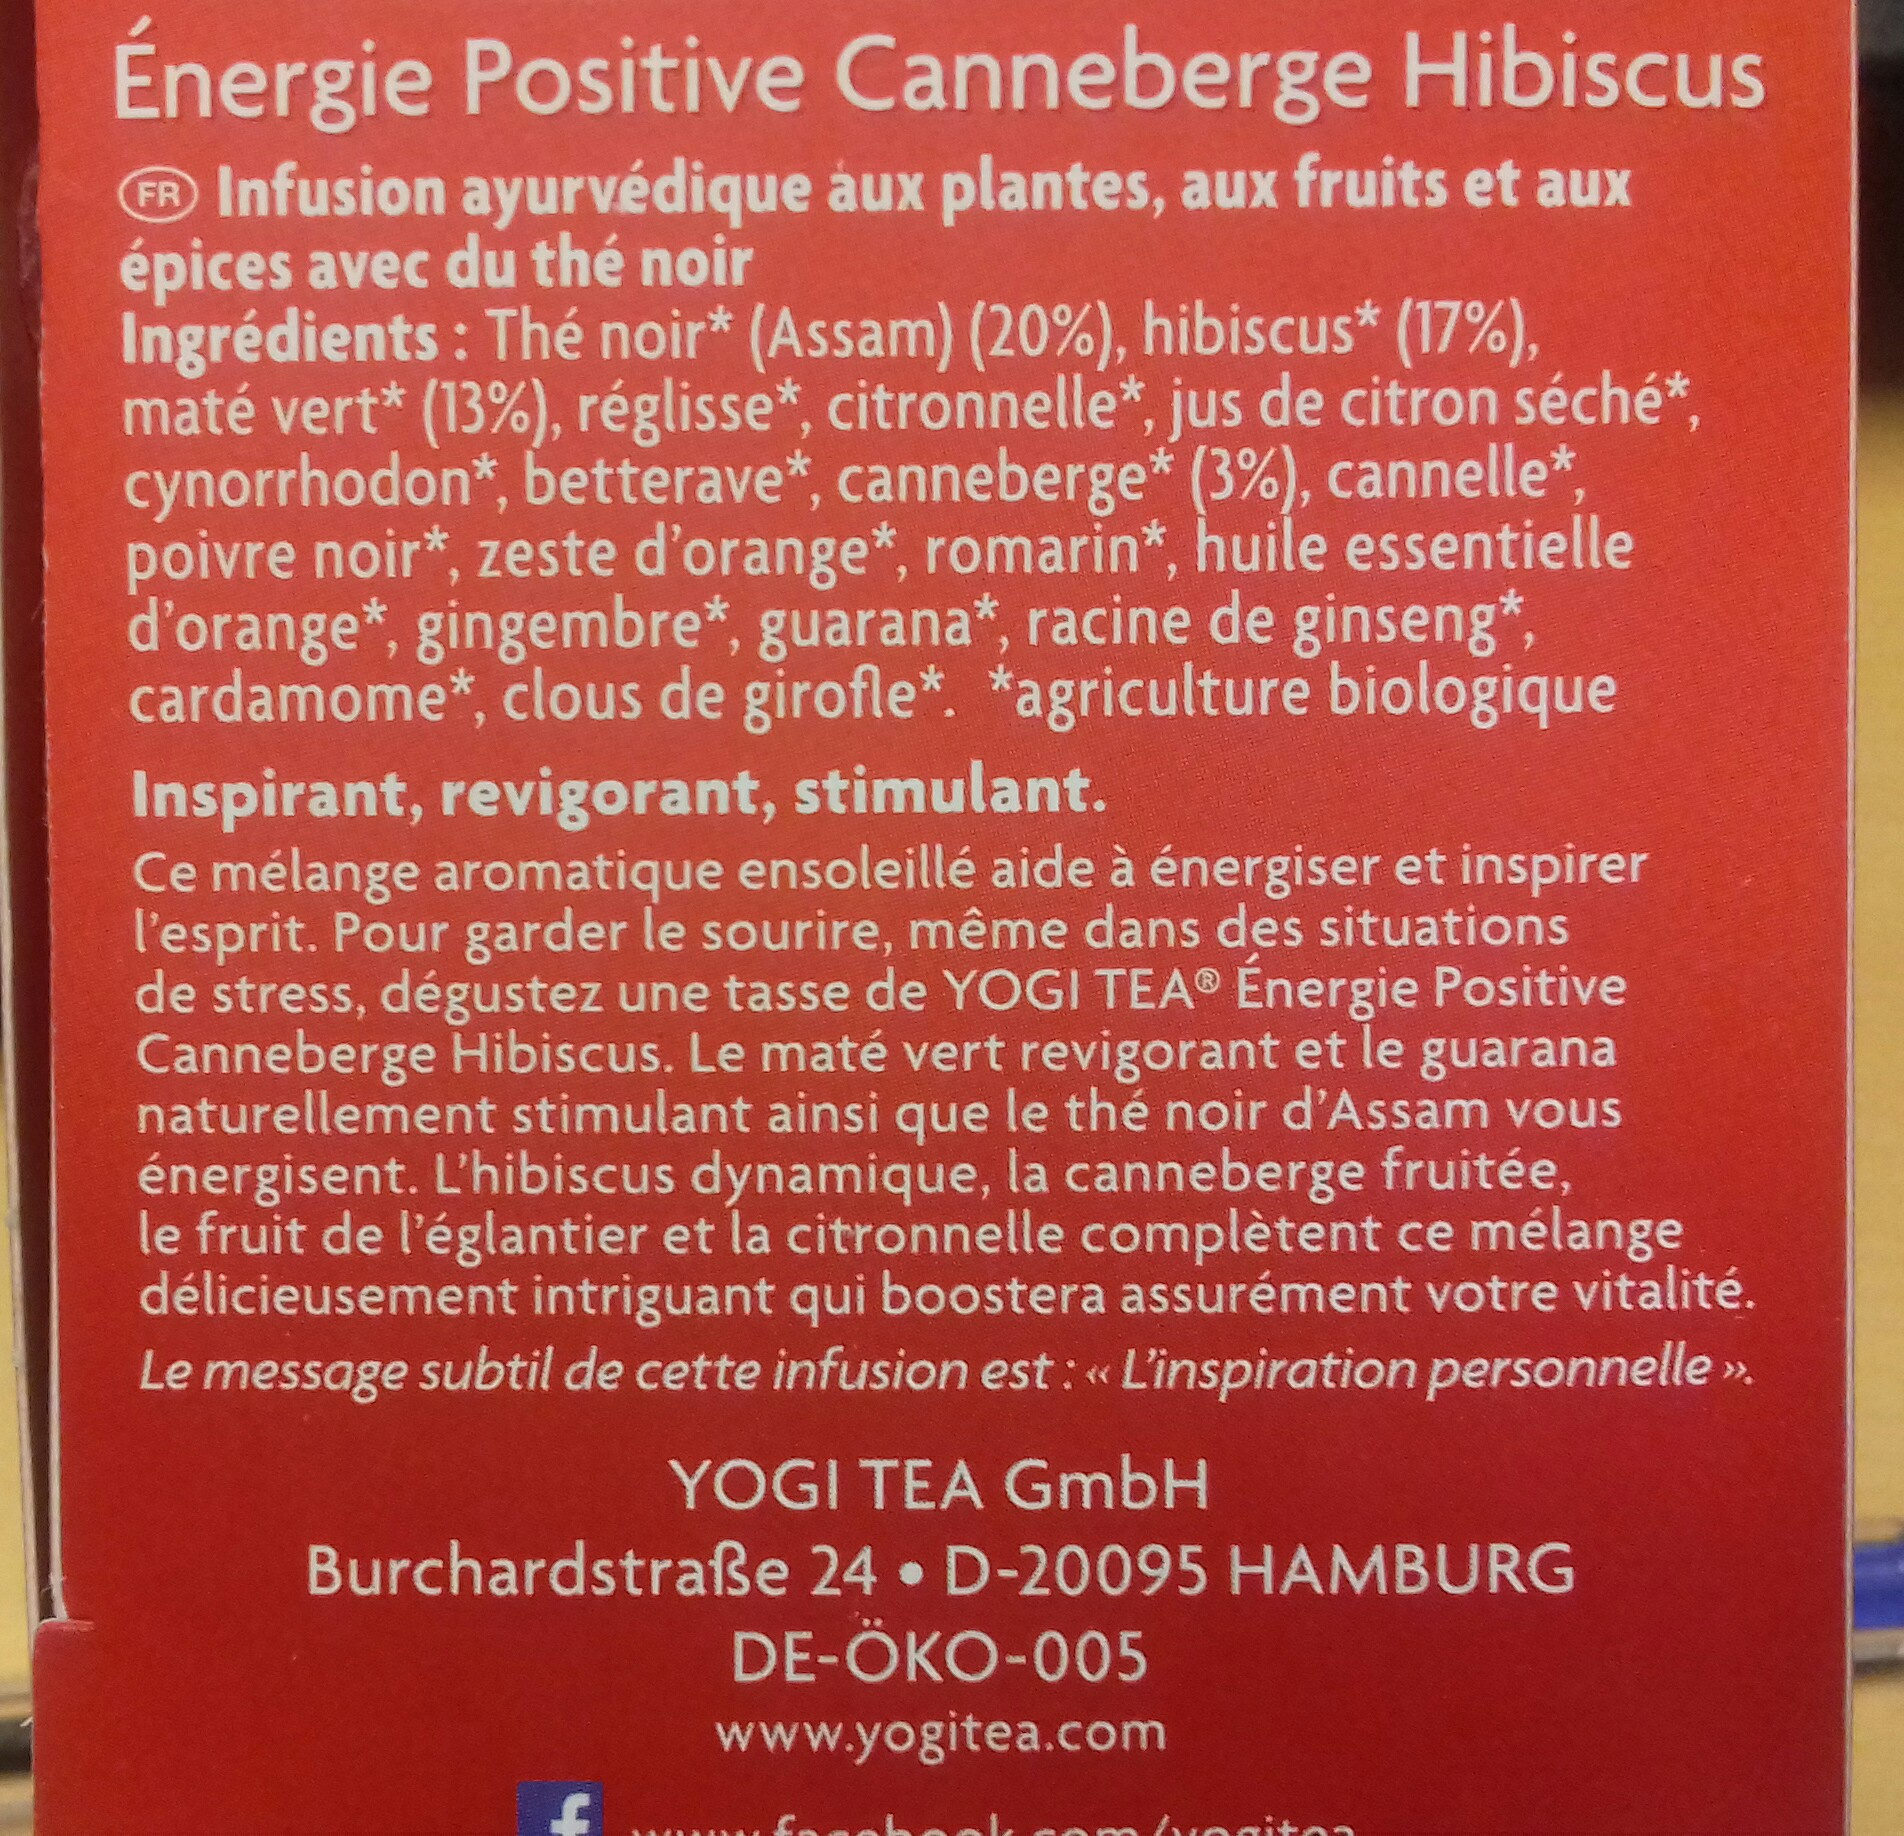 cranberry hibiscus - Ingredients - fr